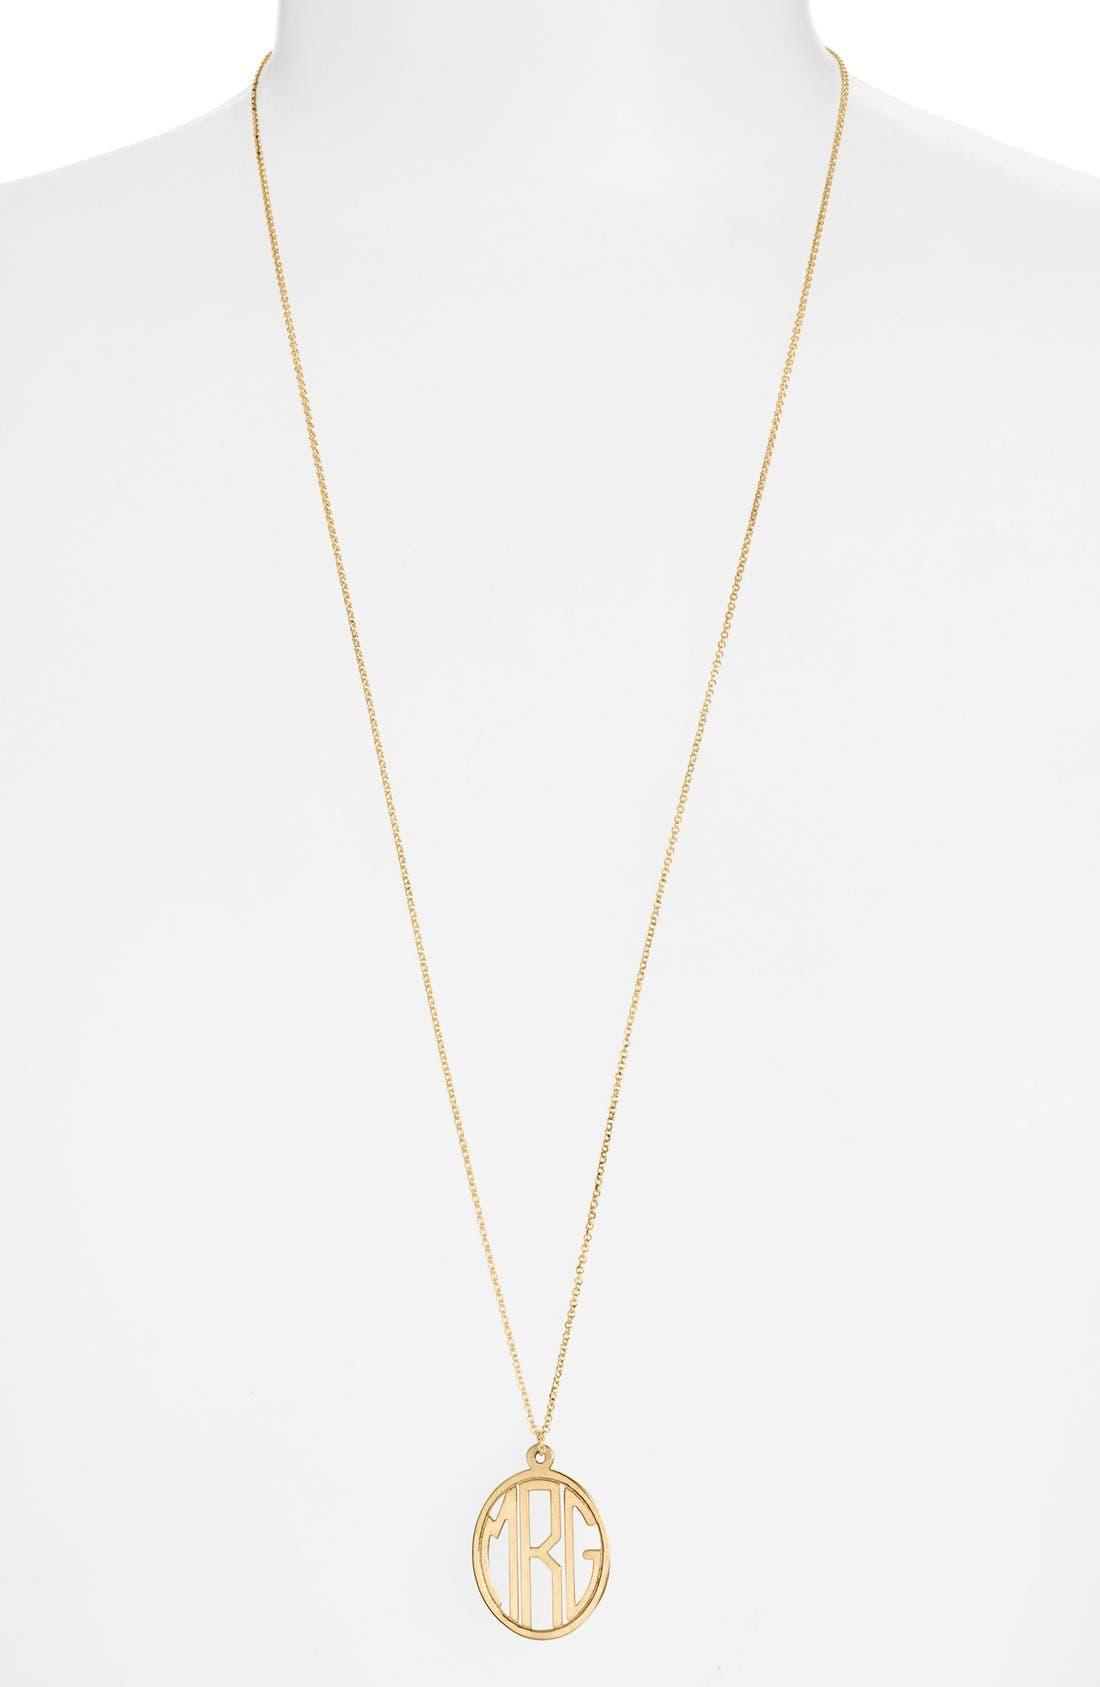 ARGENTO VIVO Personalized Monogram Pendant Necklace